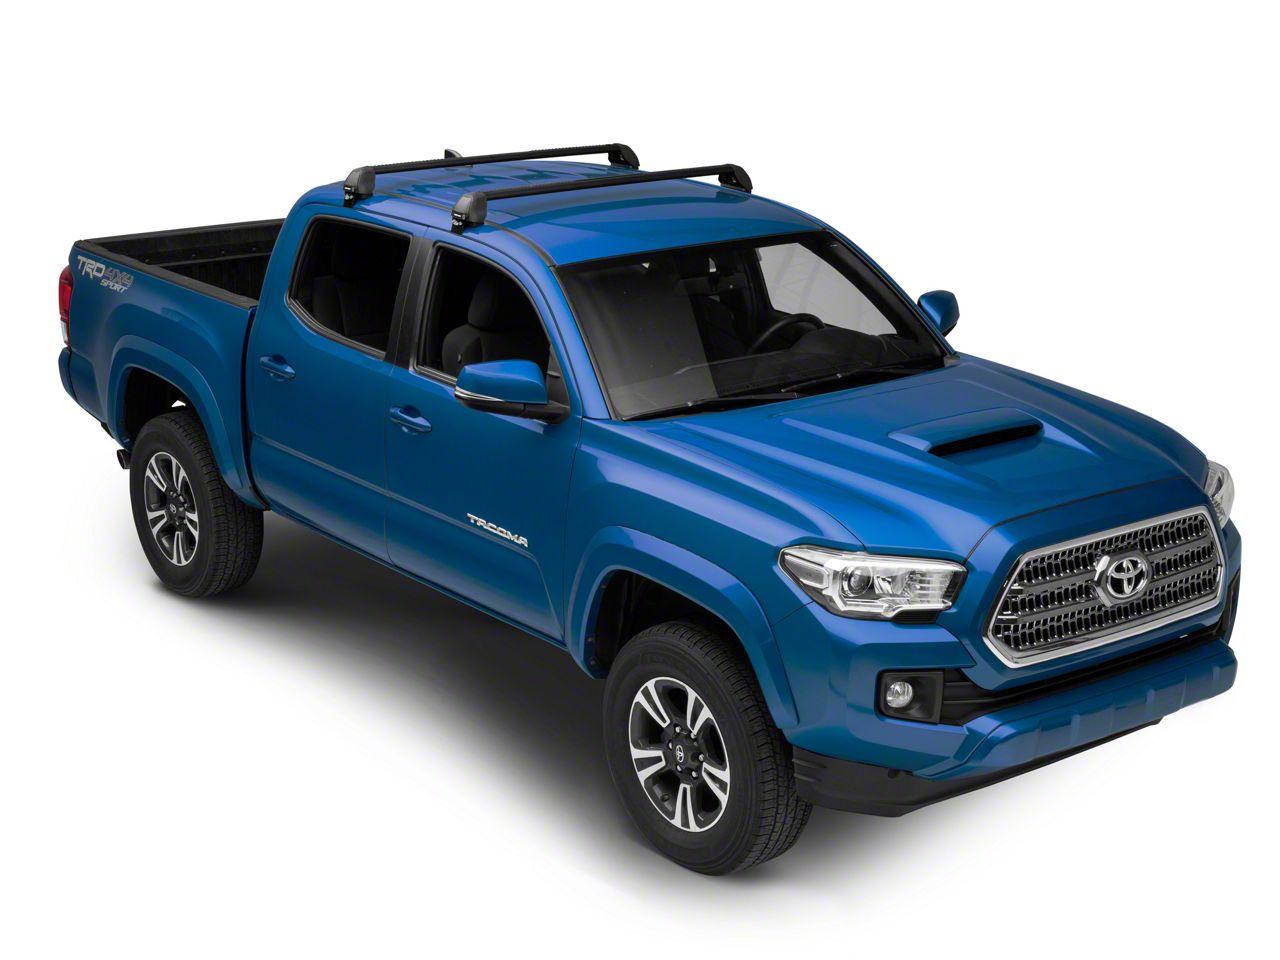 Rhino-Rack Vortex 2500 RS 2-Bar Roof Rack - Black (05-19 Tacoma Double Cab)